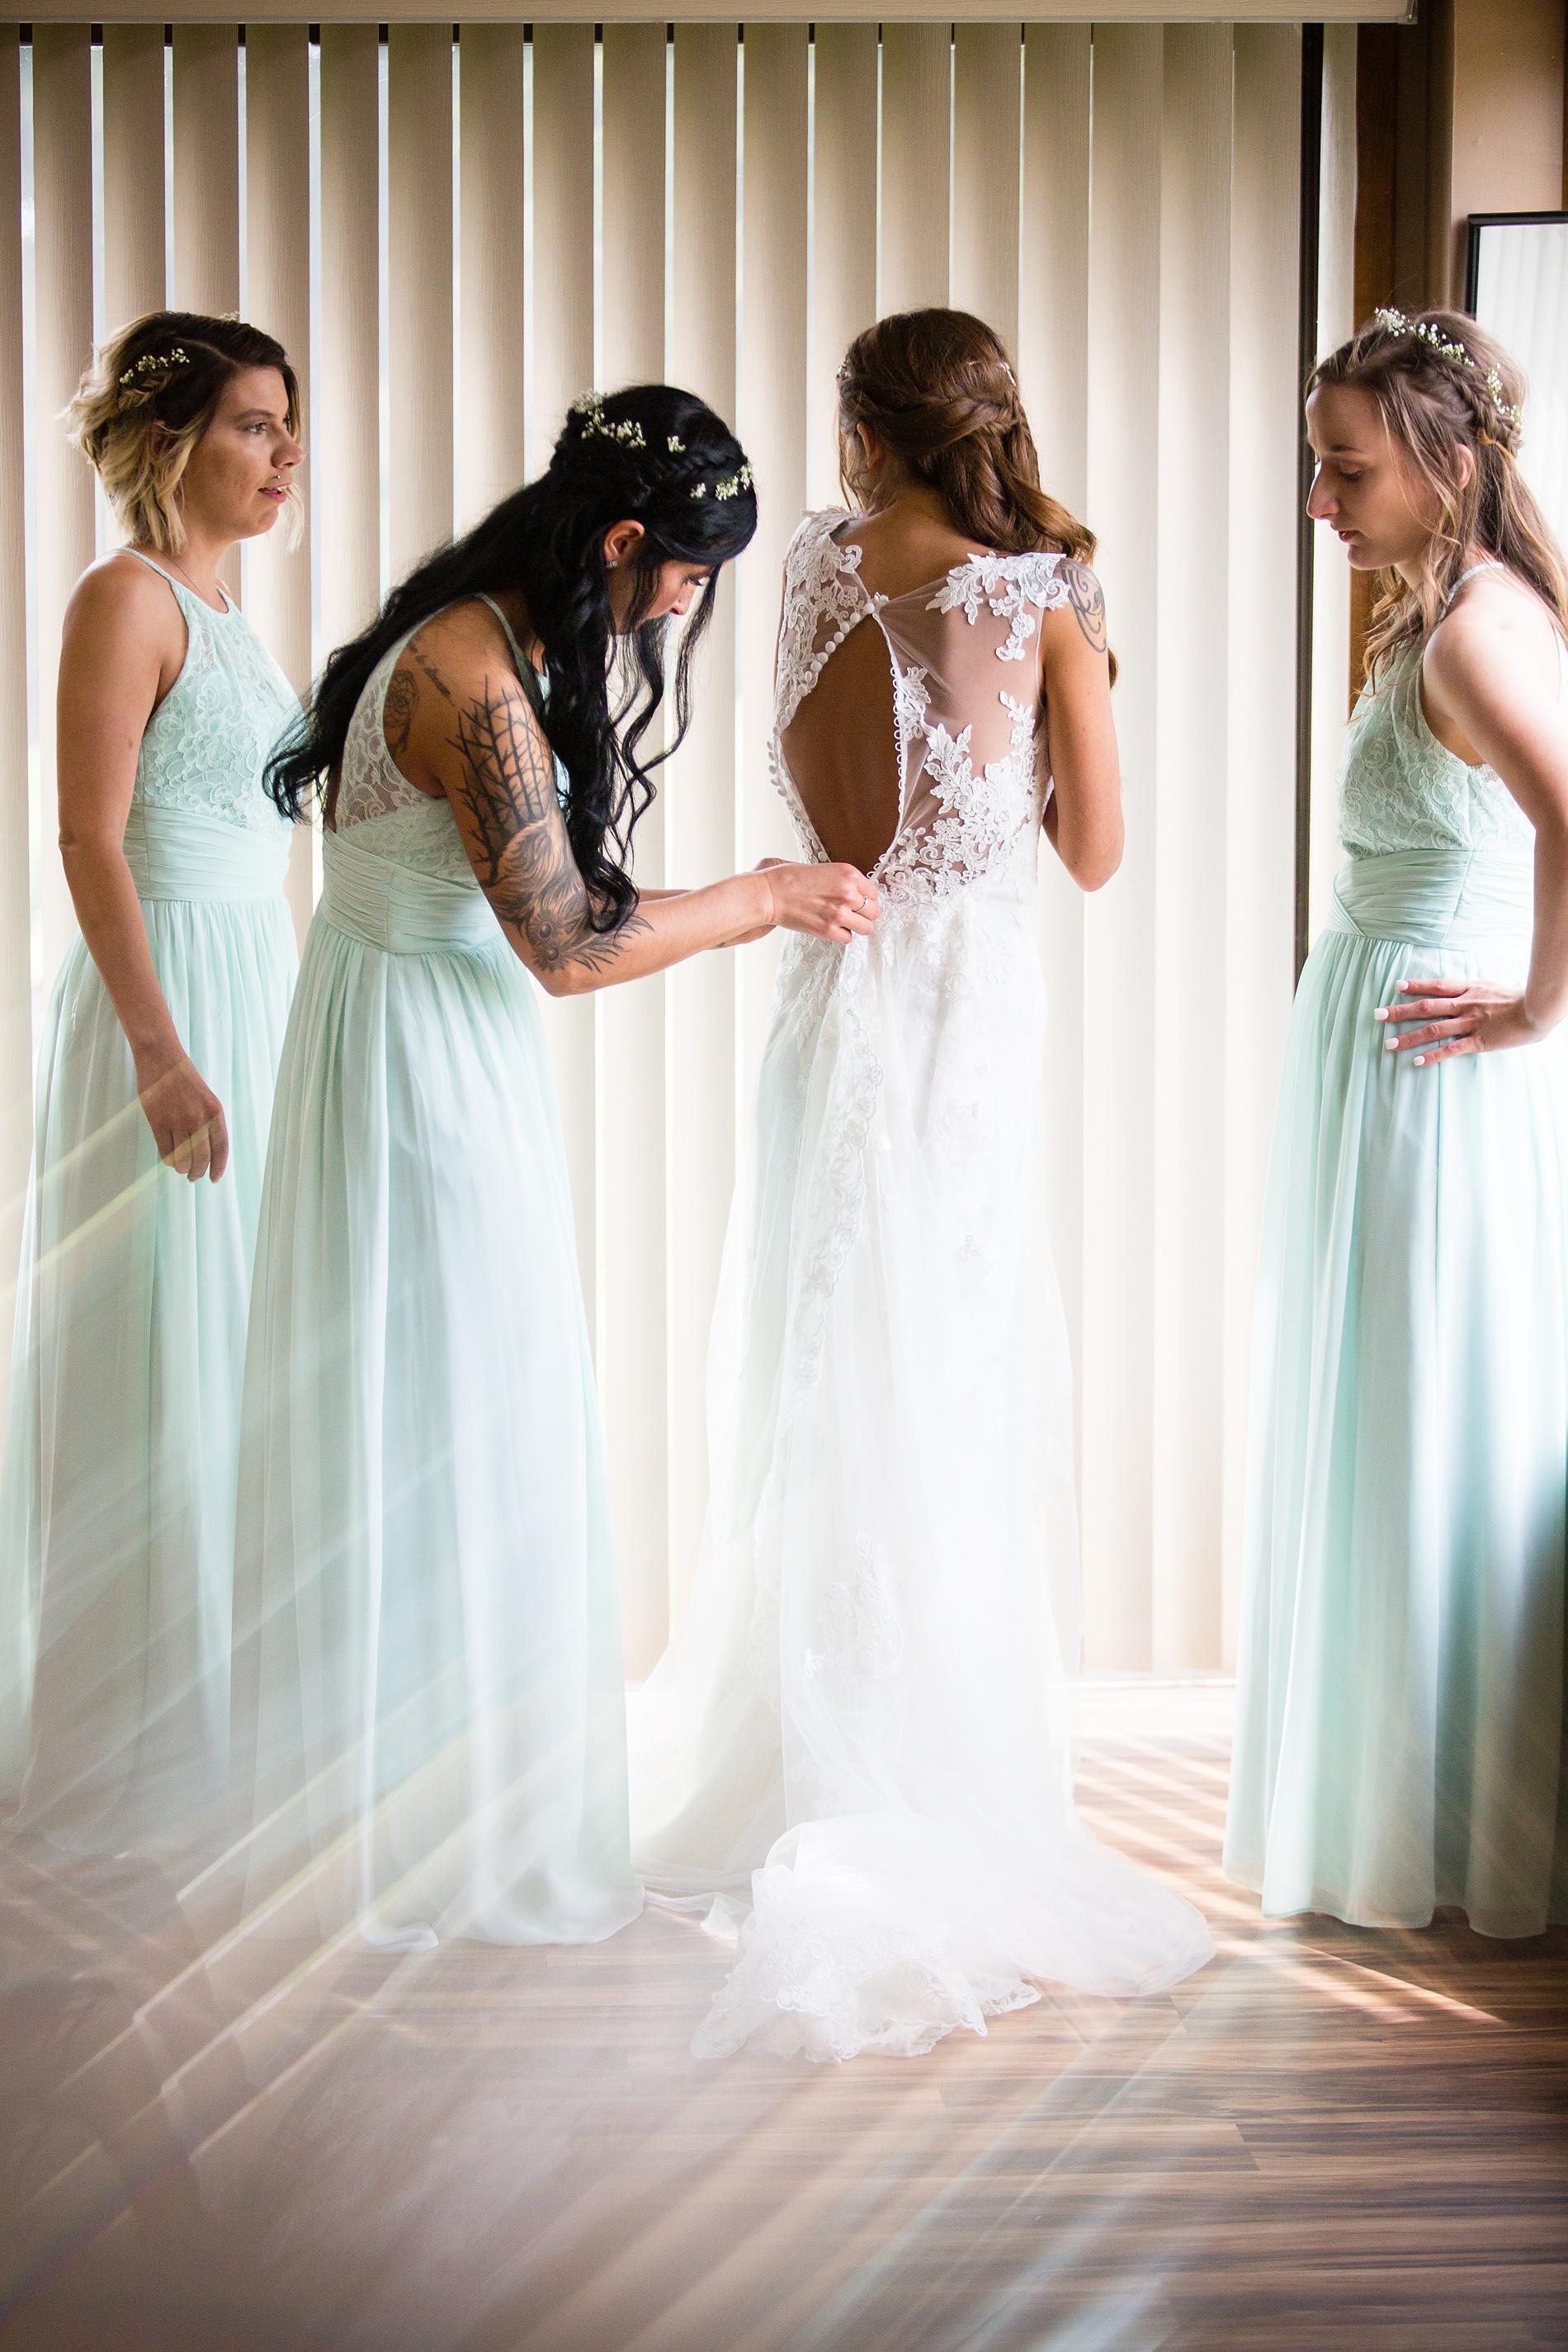 Brandon_Shafer_Photography_Brett_Autumn_Wedding_0025.jpg